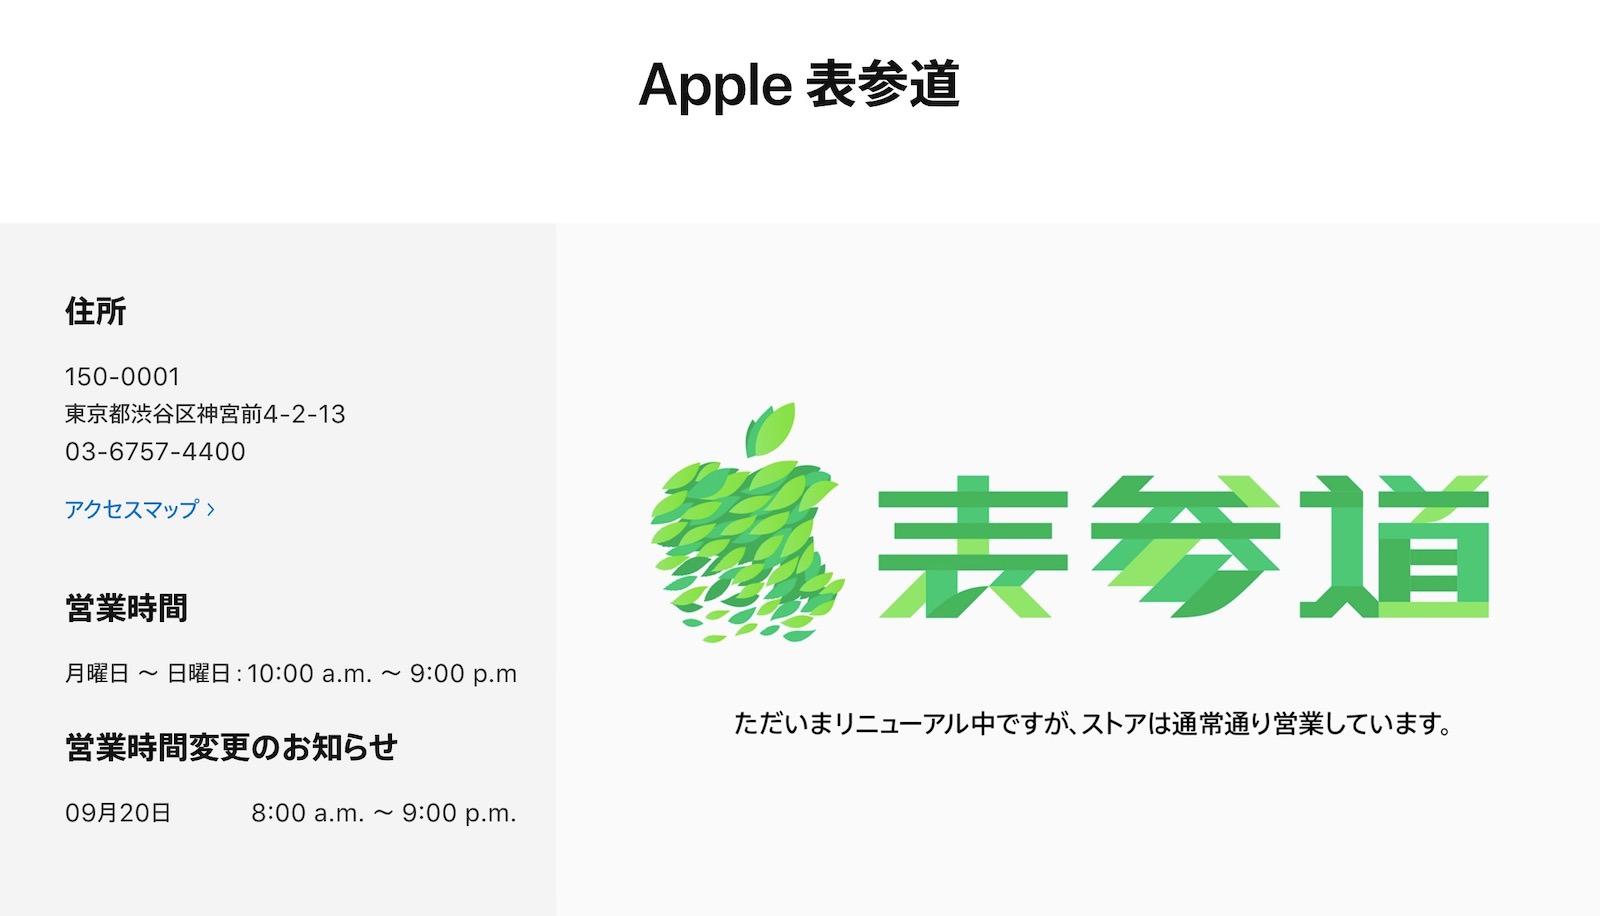 Apple Omotesando sep20 opens early